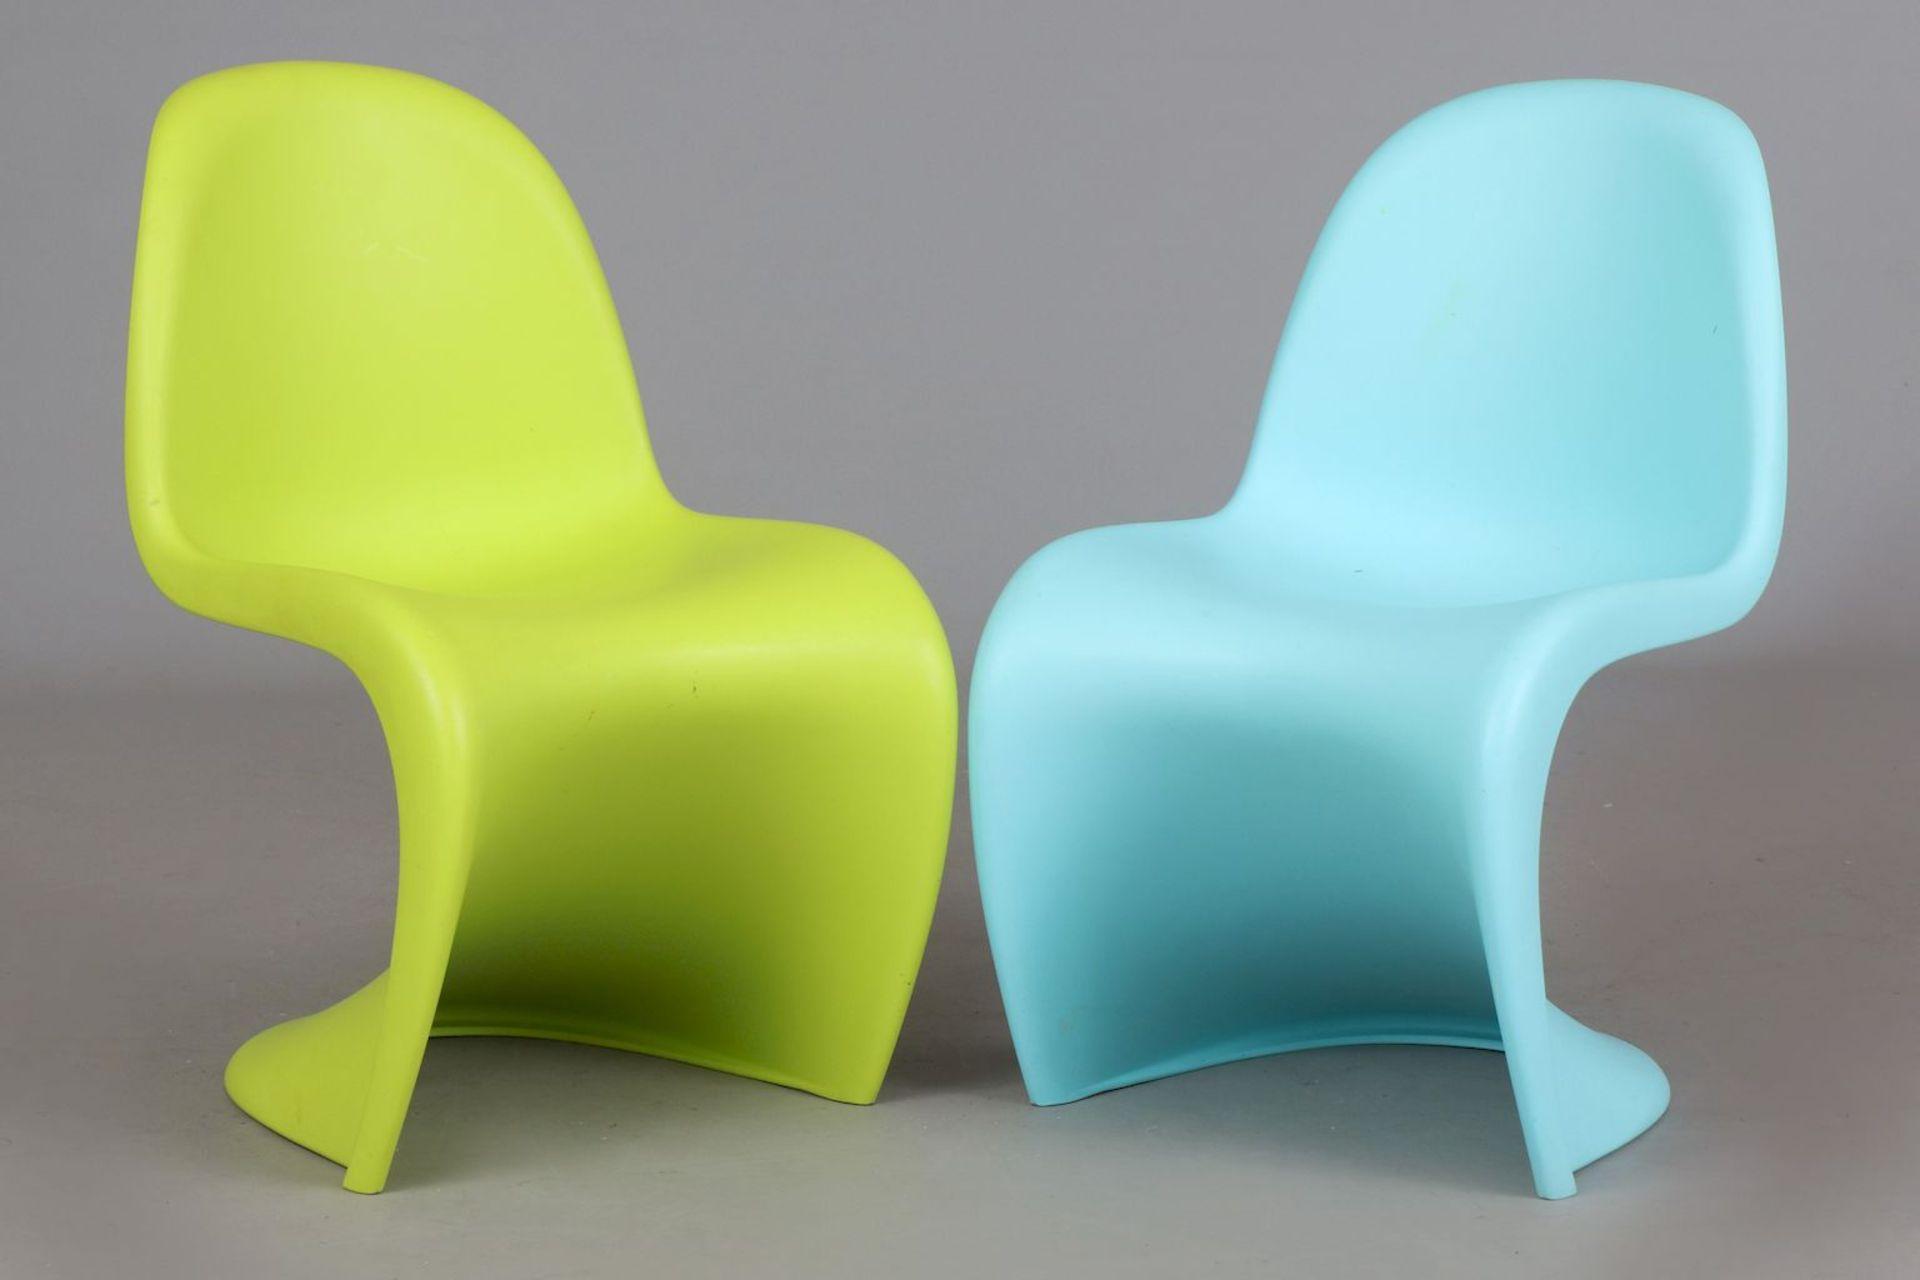 2 VERNER PANTON Kinder (Junior) ¨Panton Chairs¨ - Image 2 of 5